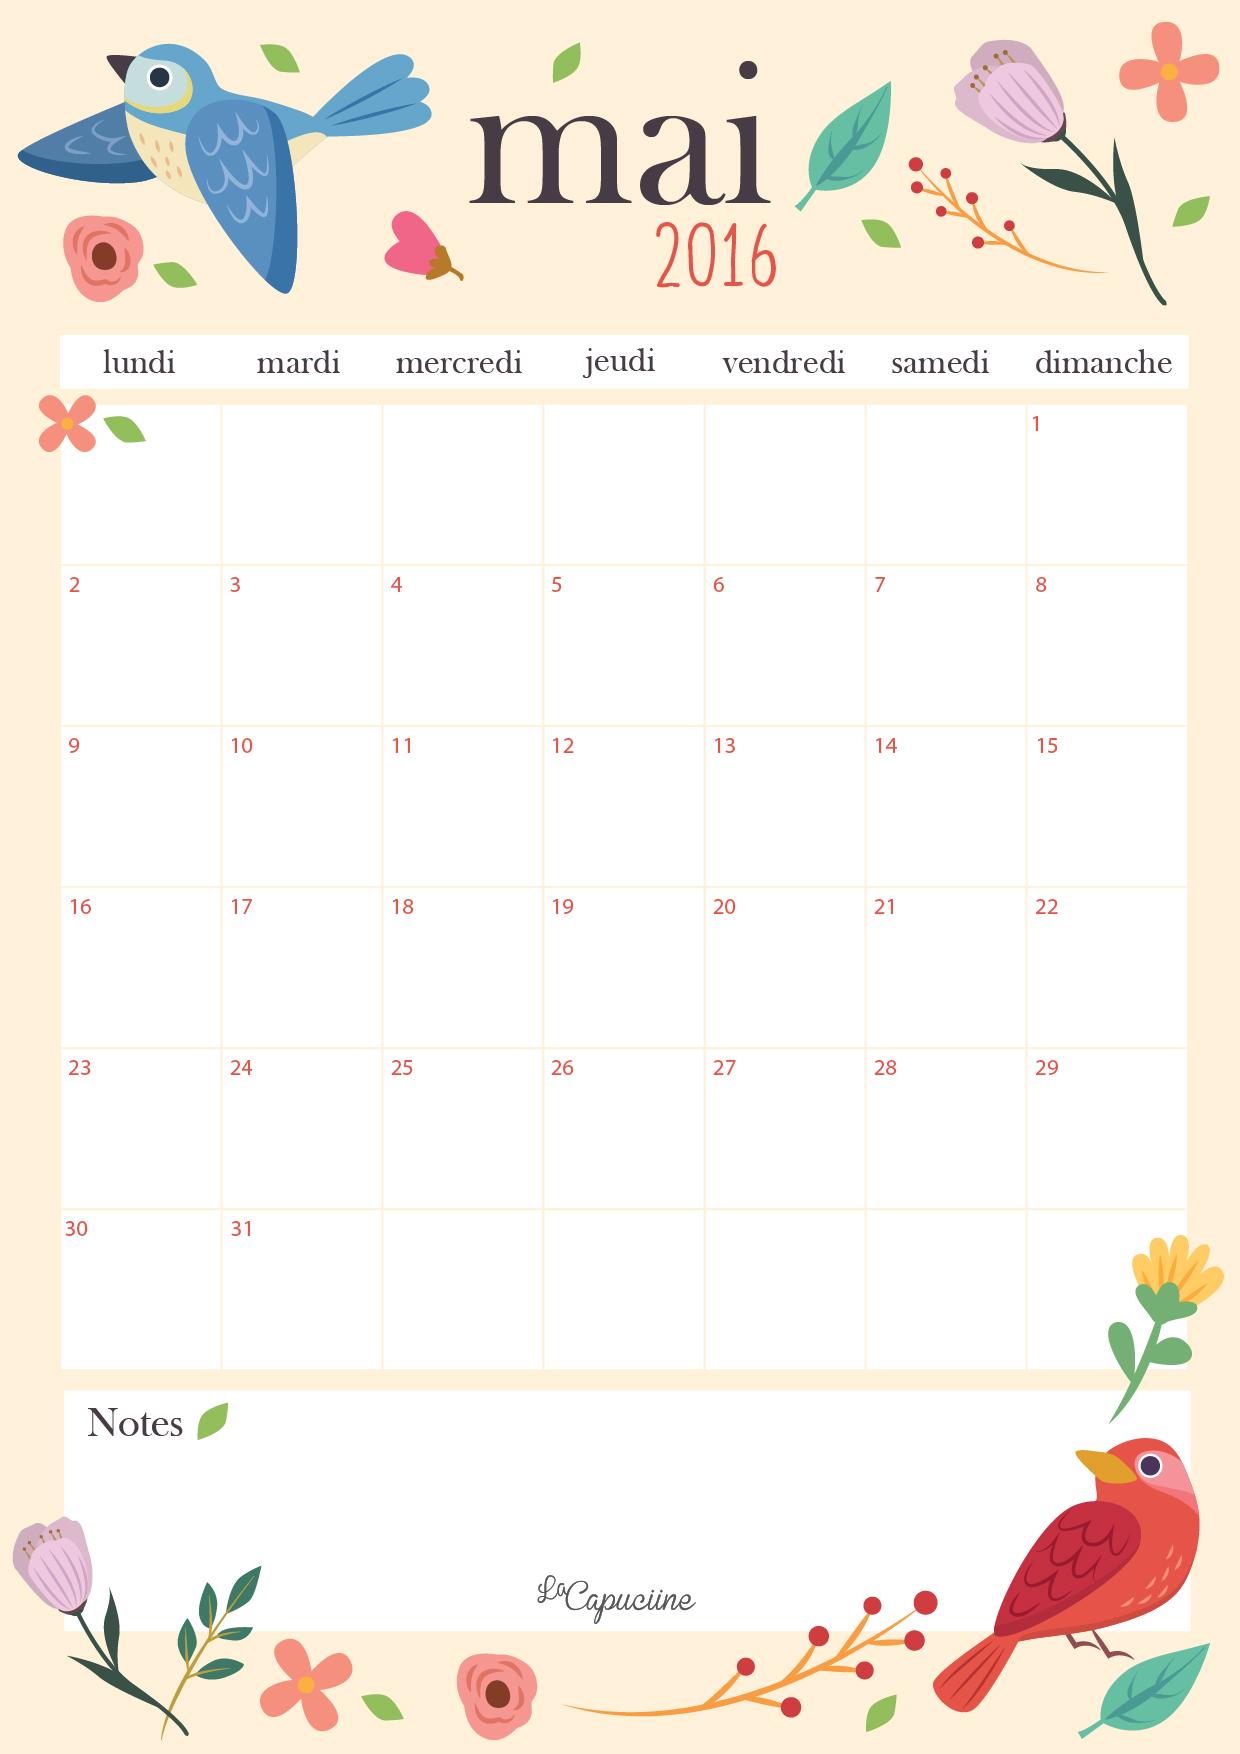 calendrier-mai2016-lacapuciine